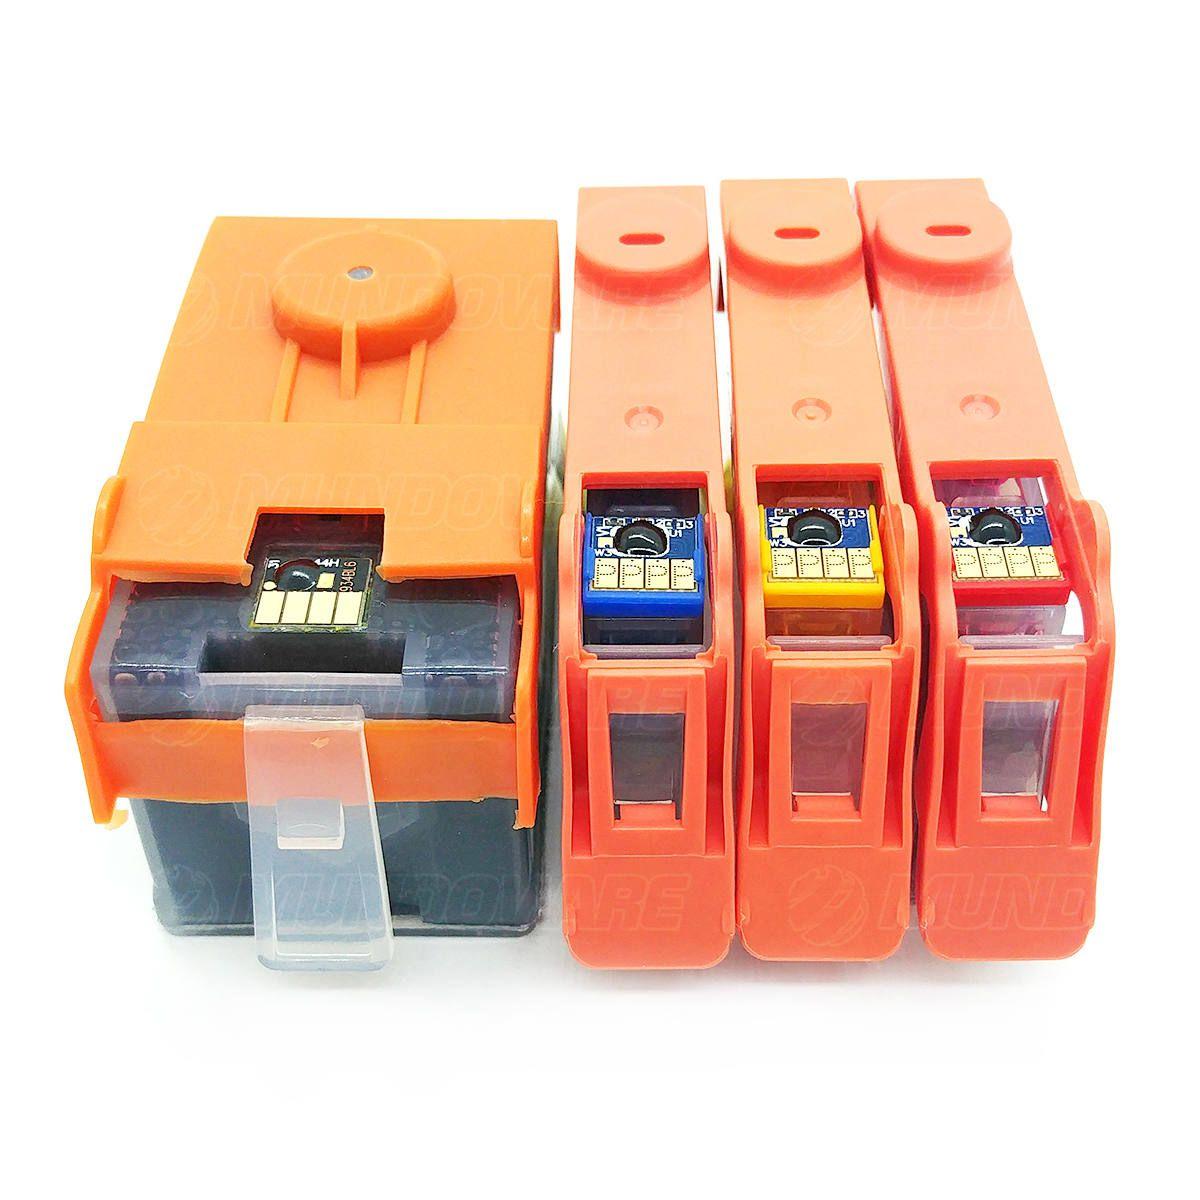 Compatível: Kit Colorido de Cartucho de Tinta 934xl 935xl para Impressora HP Pro 6230 6830